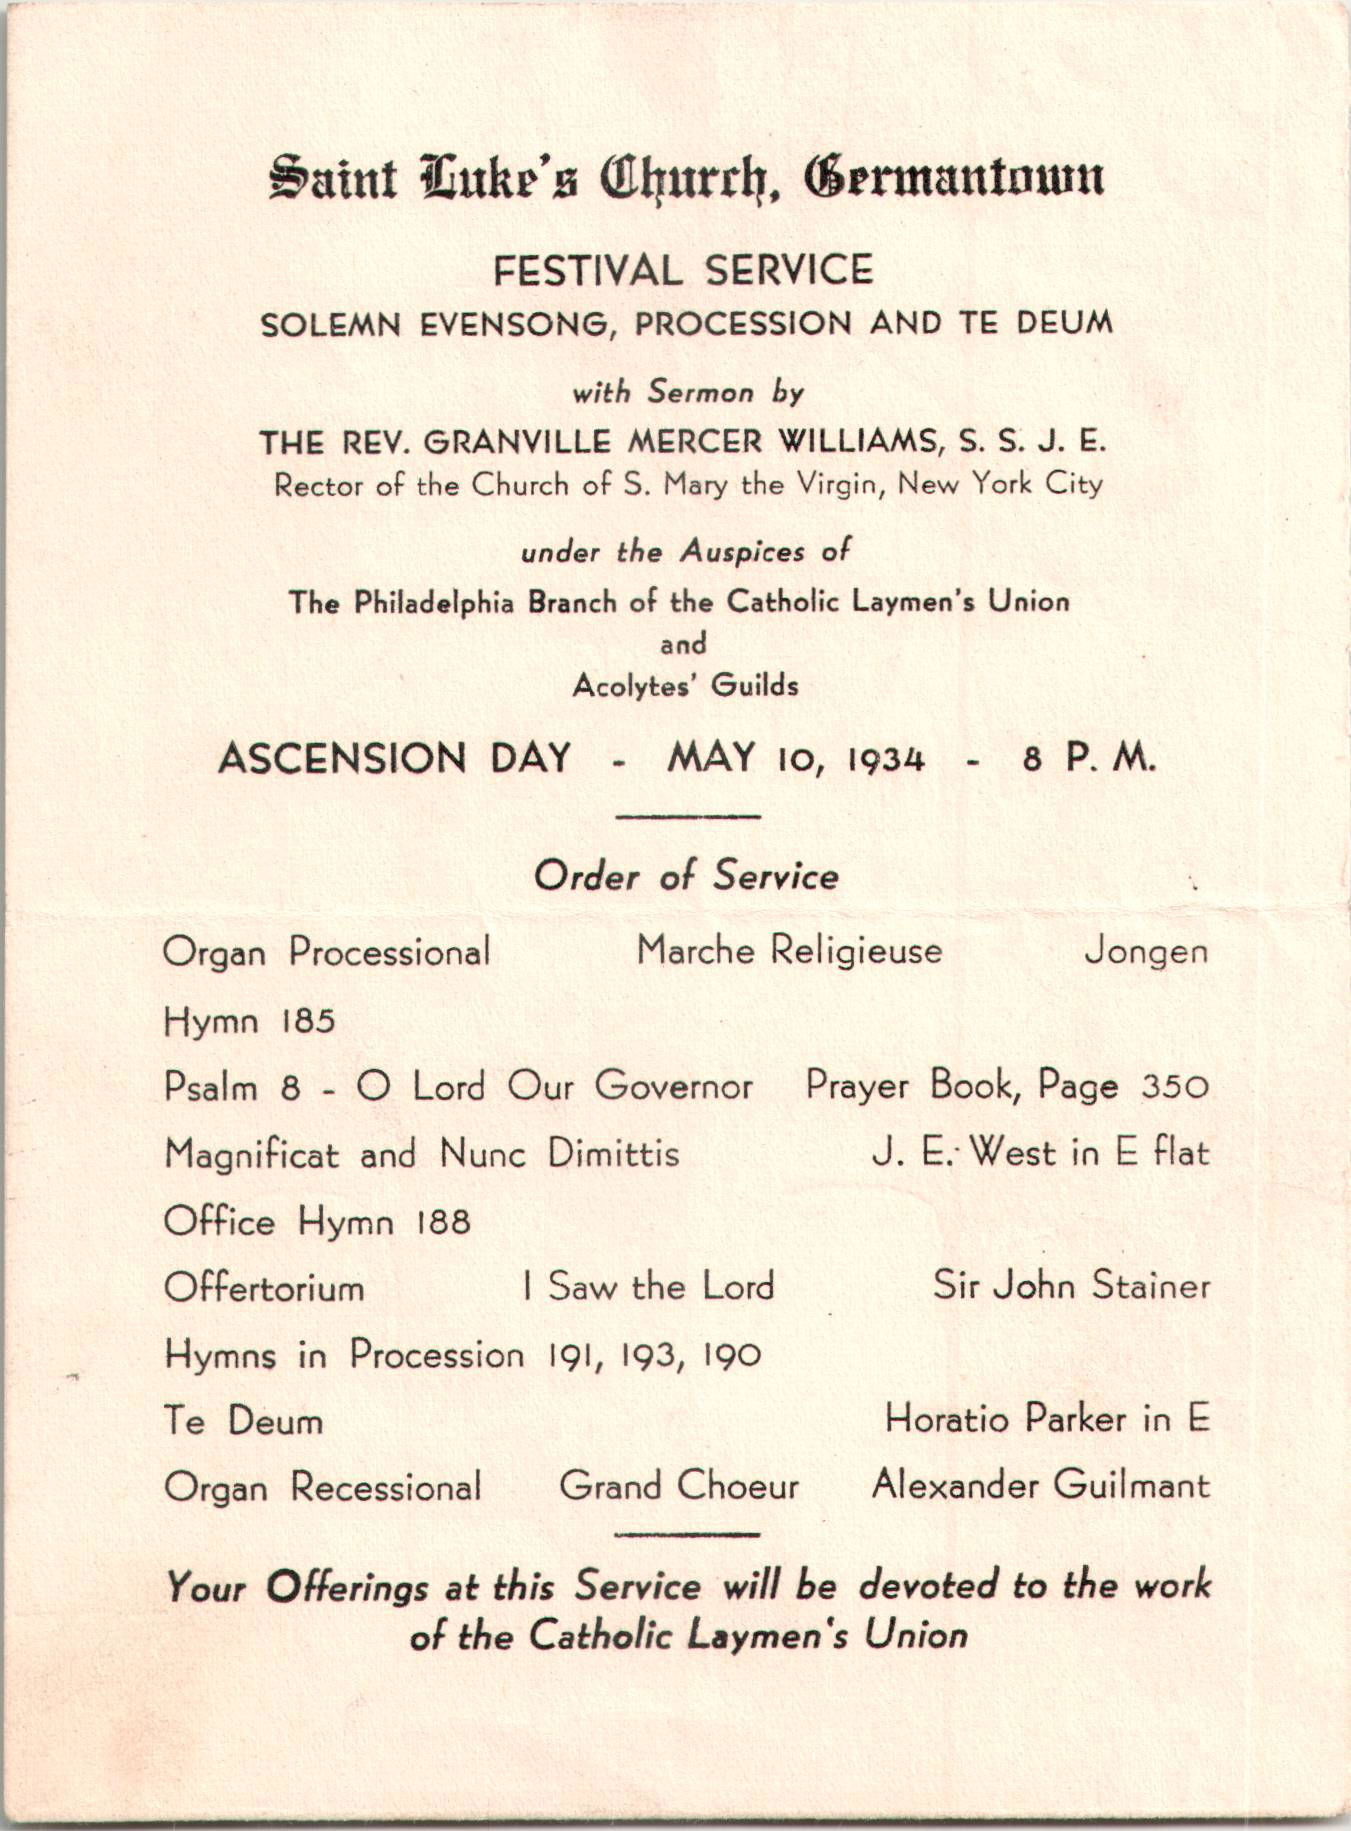 Leaflet for the Ascension Day Festival Service of Solemn